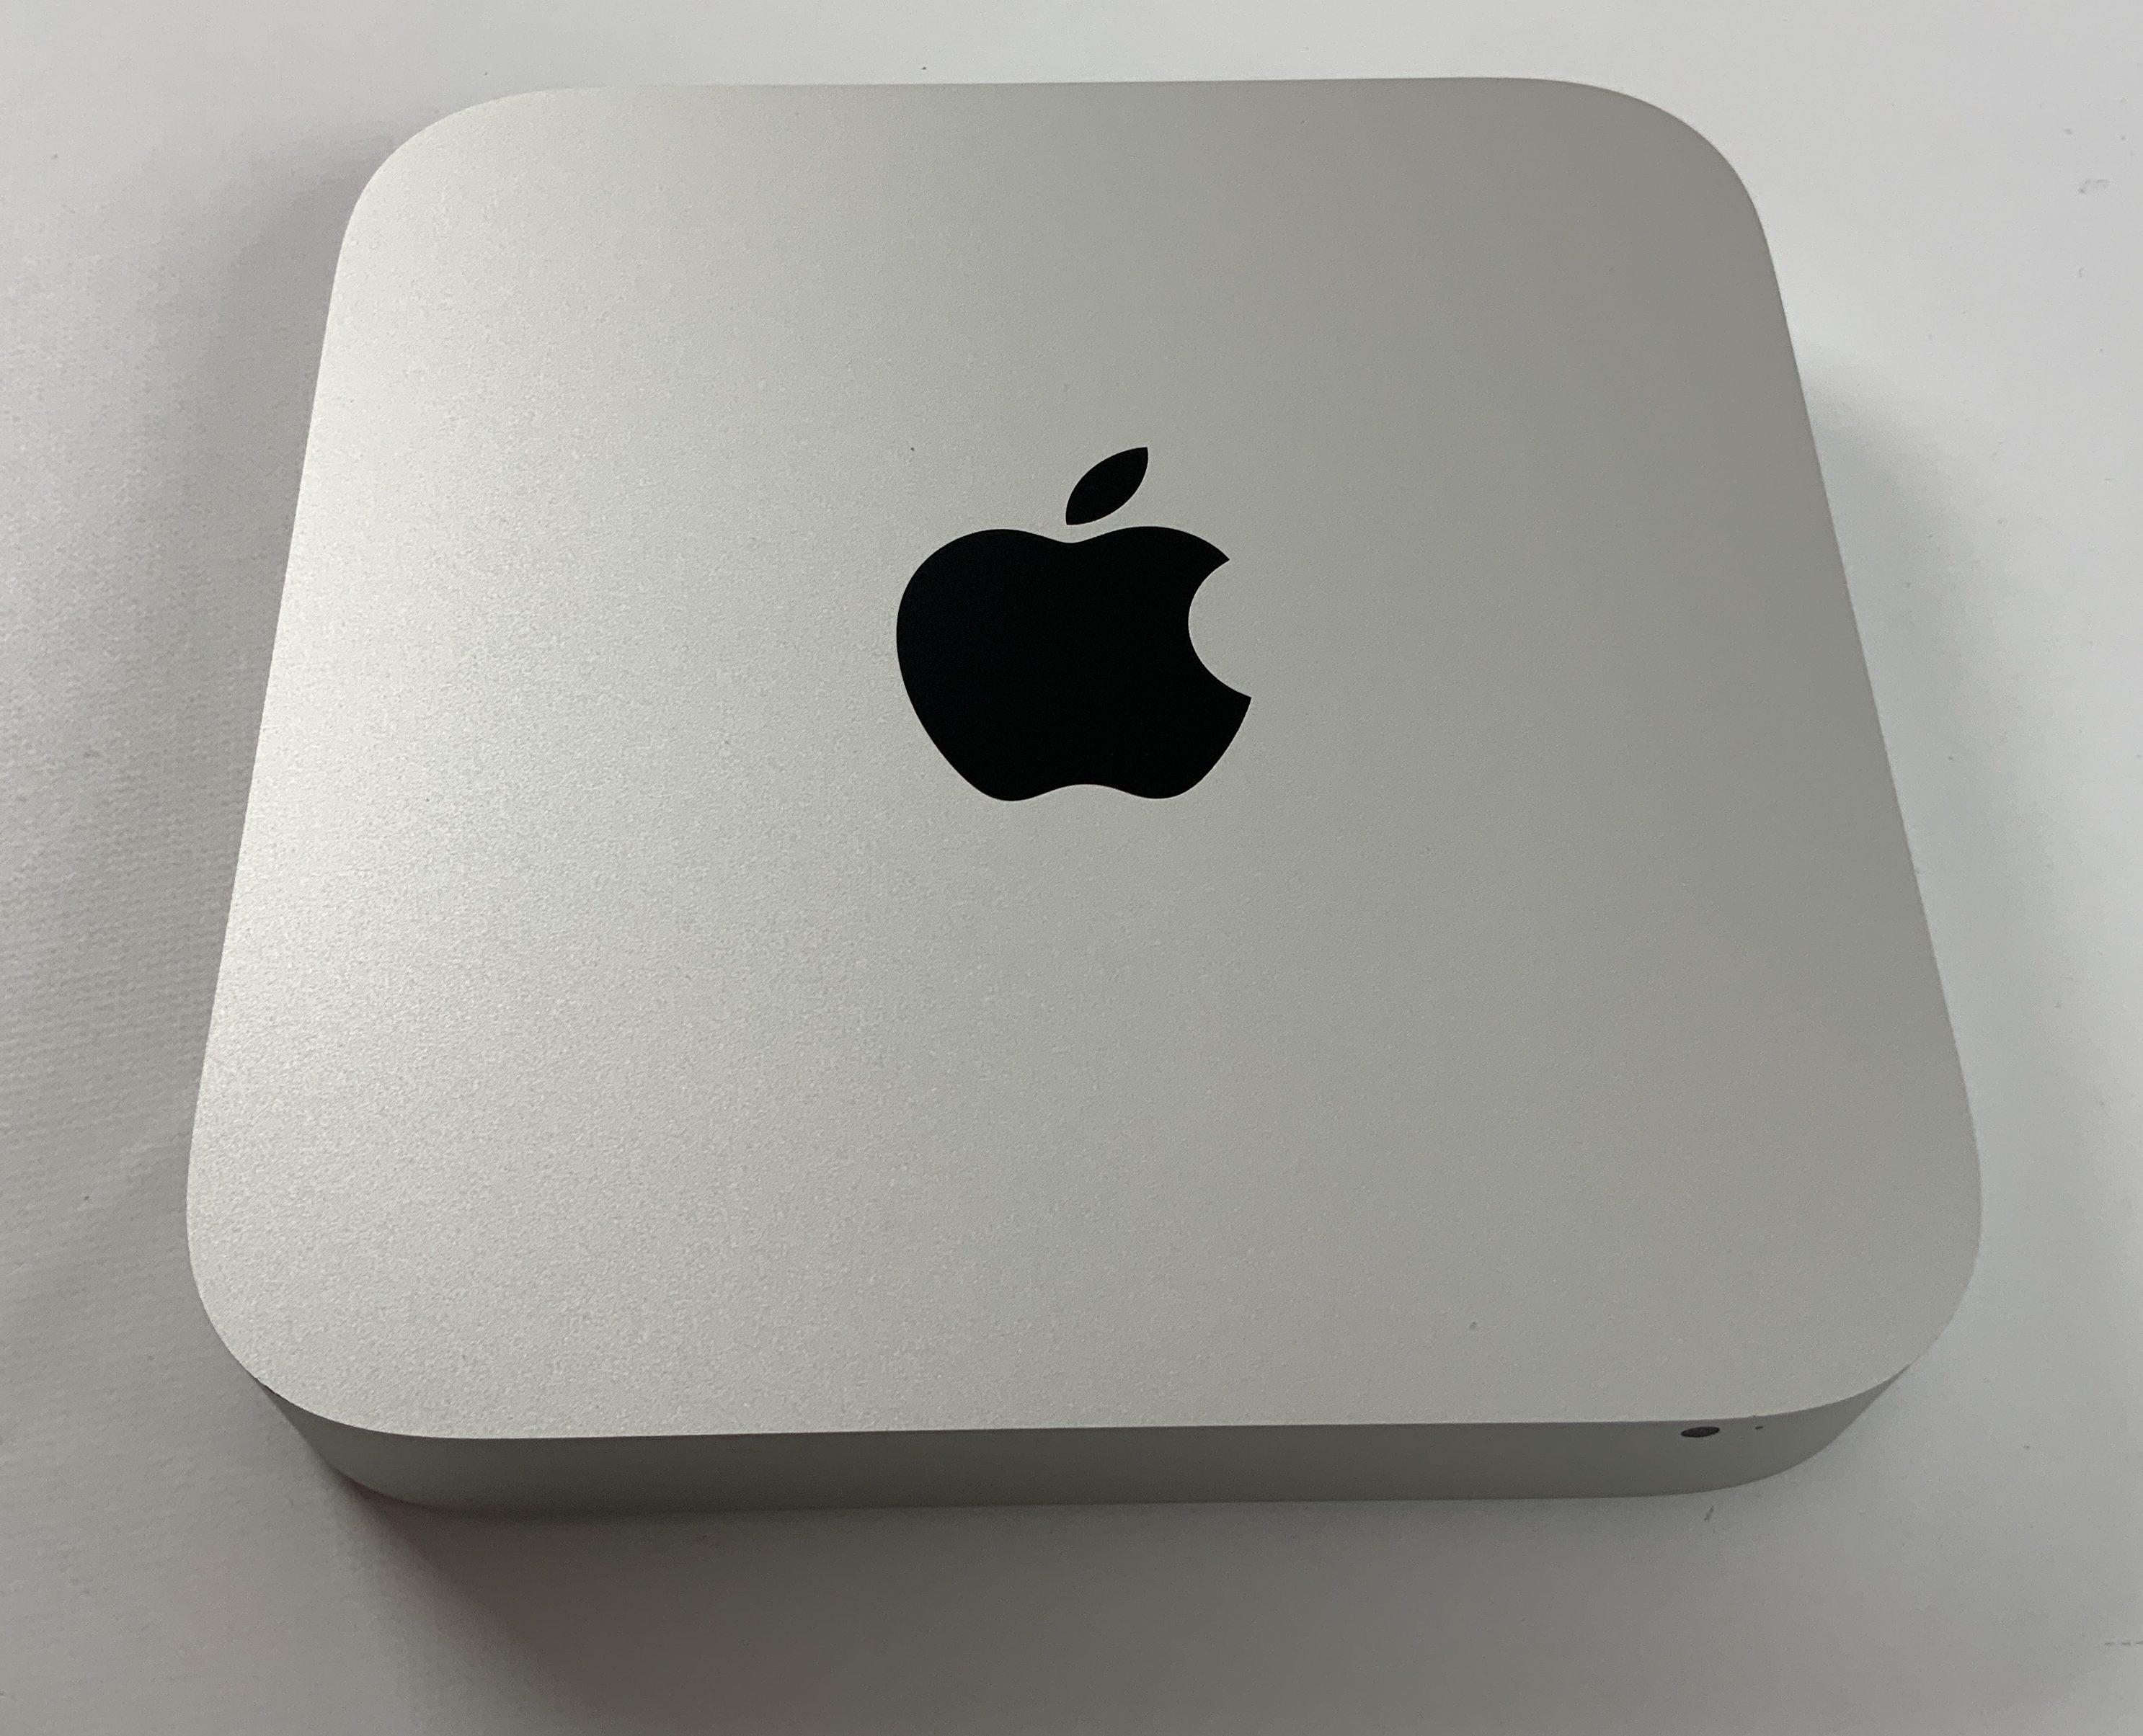 Mac Mini Late 2014 (Intel Core i7 3.0 GHz 16 GB RAM 2 TB Fusion Drive), Intel Core i7 3.0 GHz, 16 GB RAM, 2 TB Fusion Drive, Kuva 1